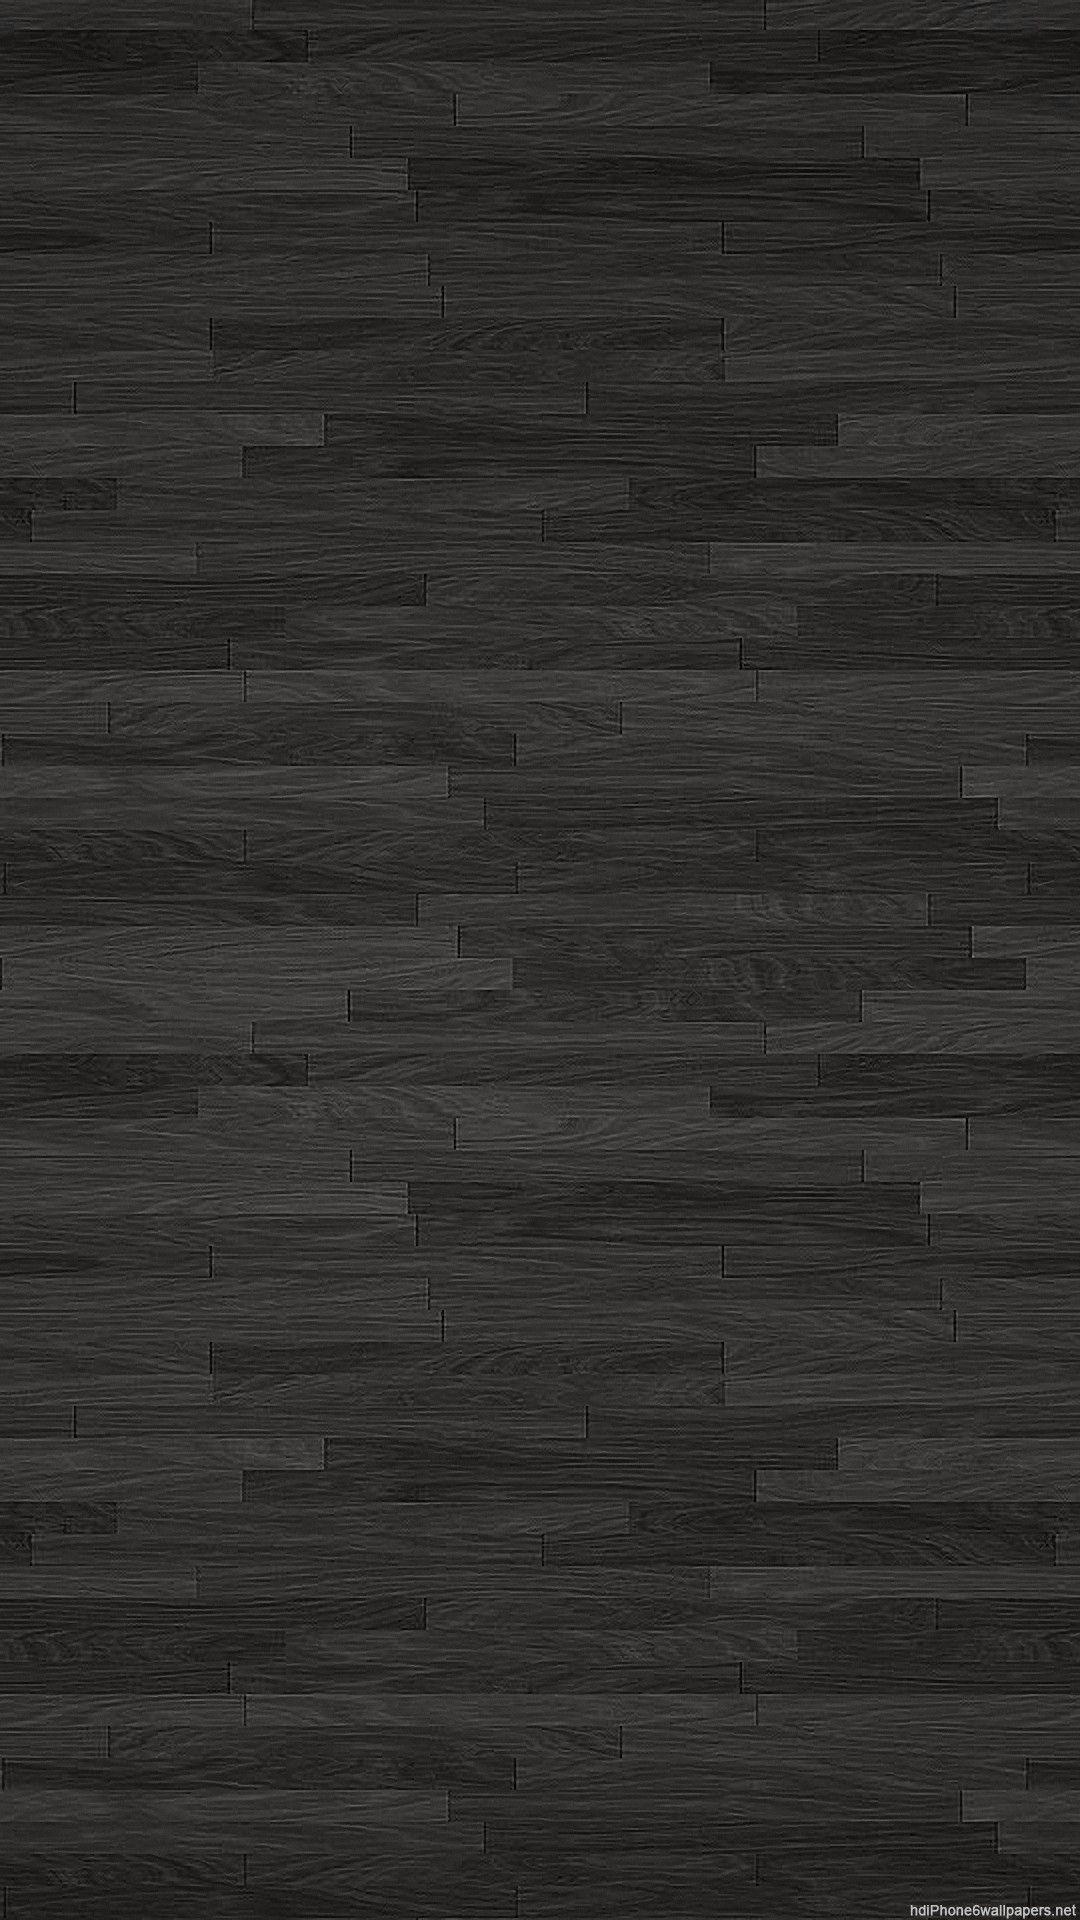 Iphone Wallpaper Black 63 En 2020 Fond Ecran Noir Fond D Ecran Iphone 7 Plus Fond D Ecran Telephone